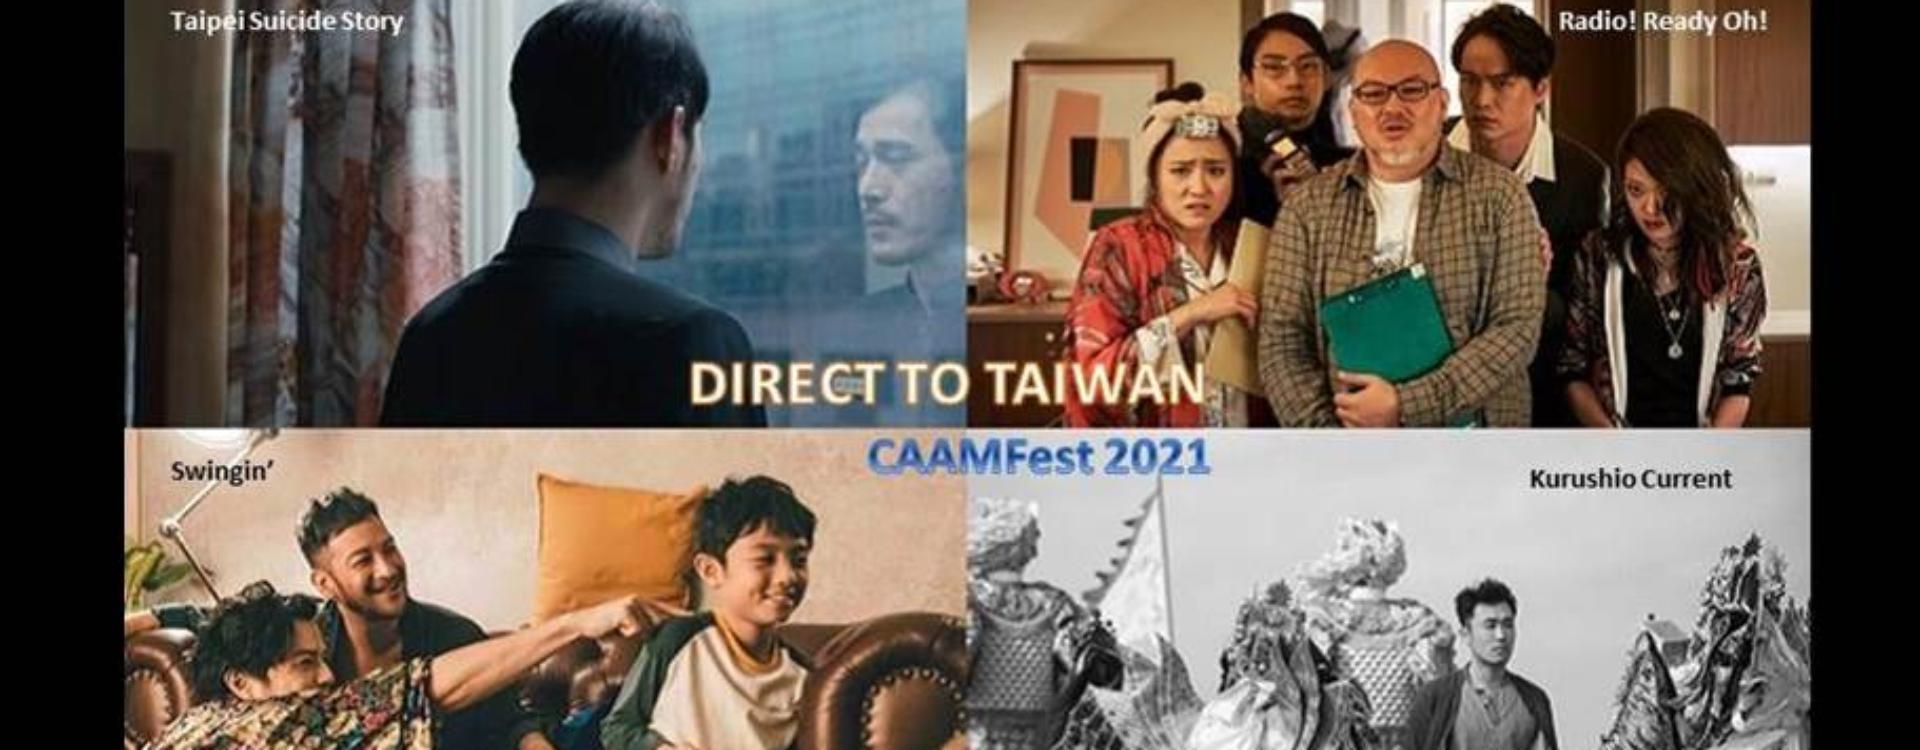 CAAMFest舊金山國際亞美電影節首度推出台灣單元「另開新視窗」